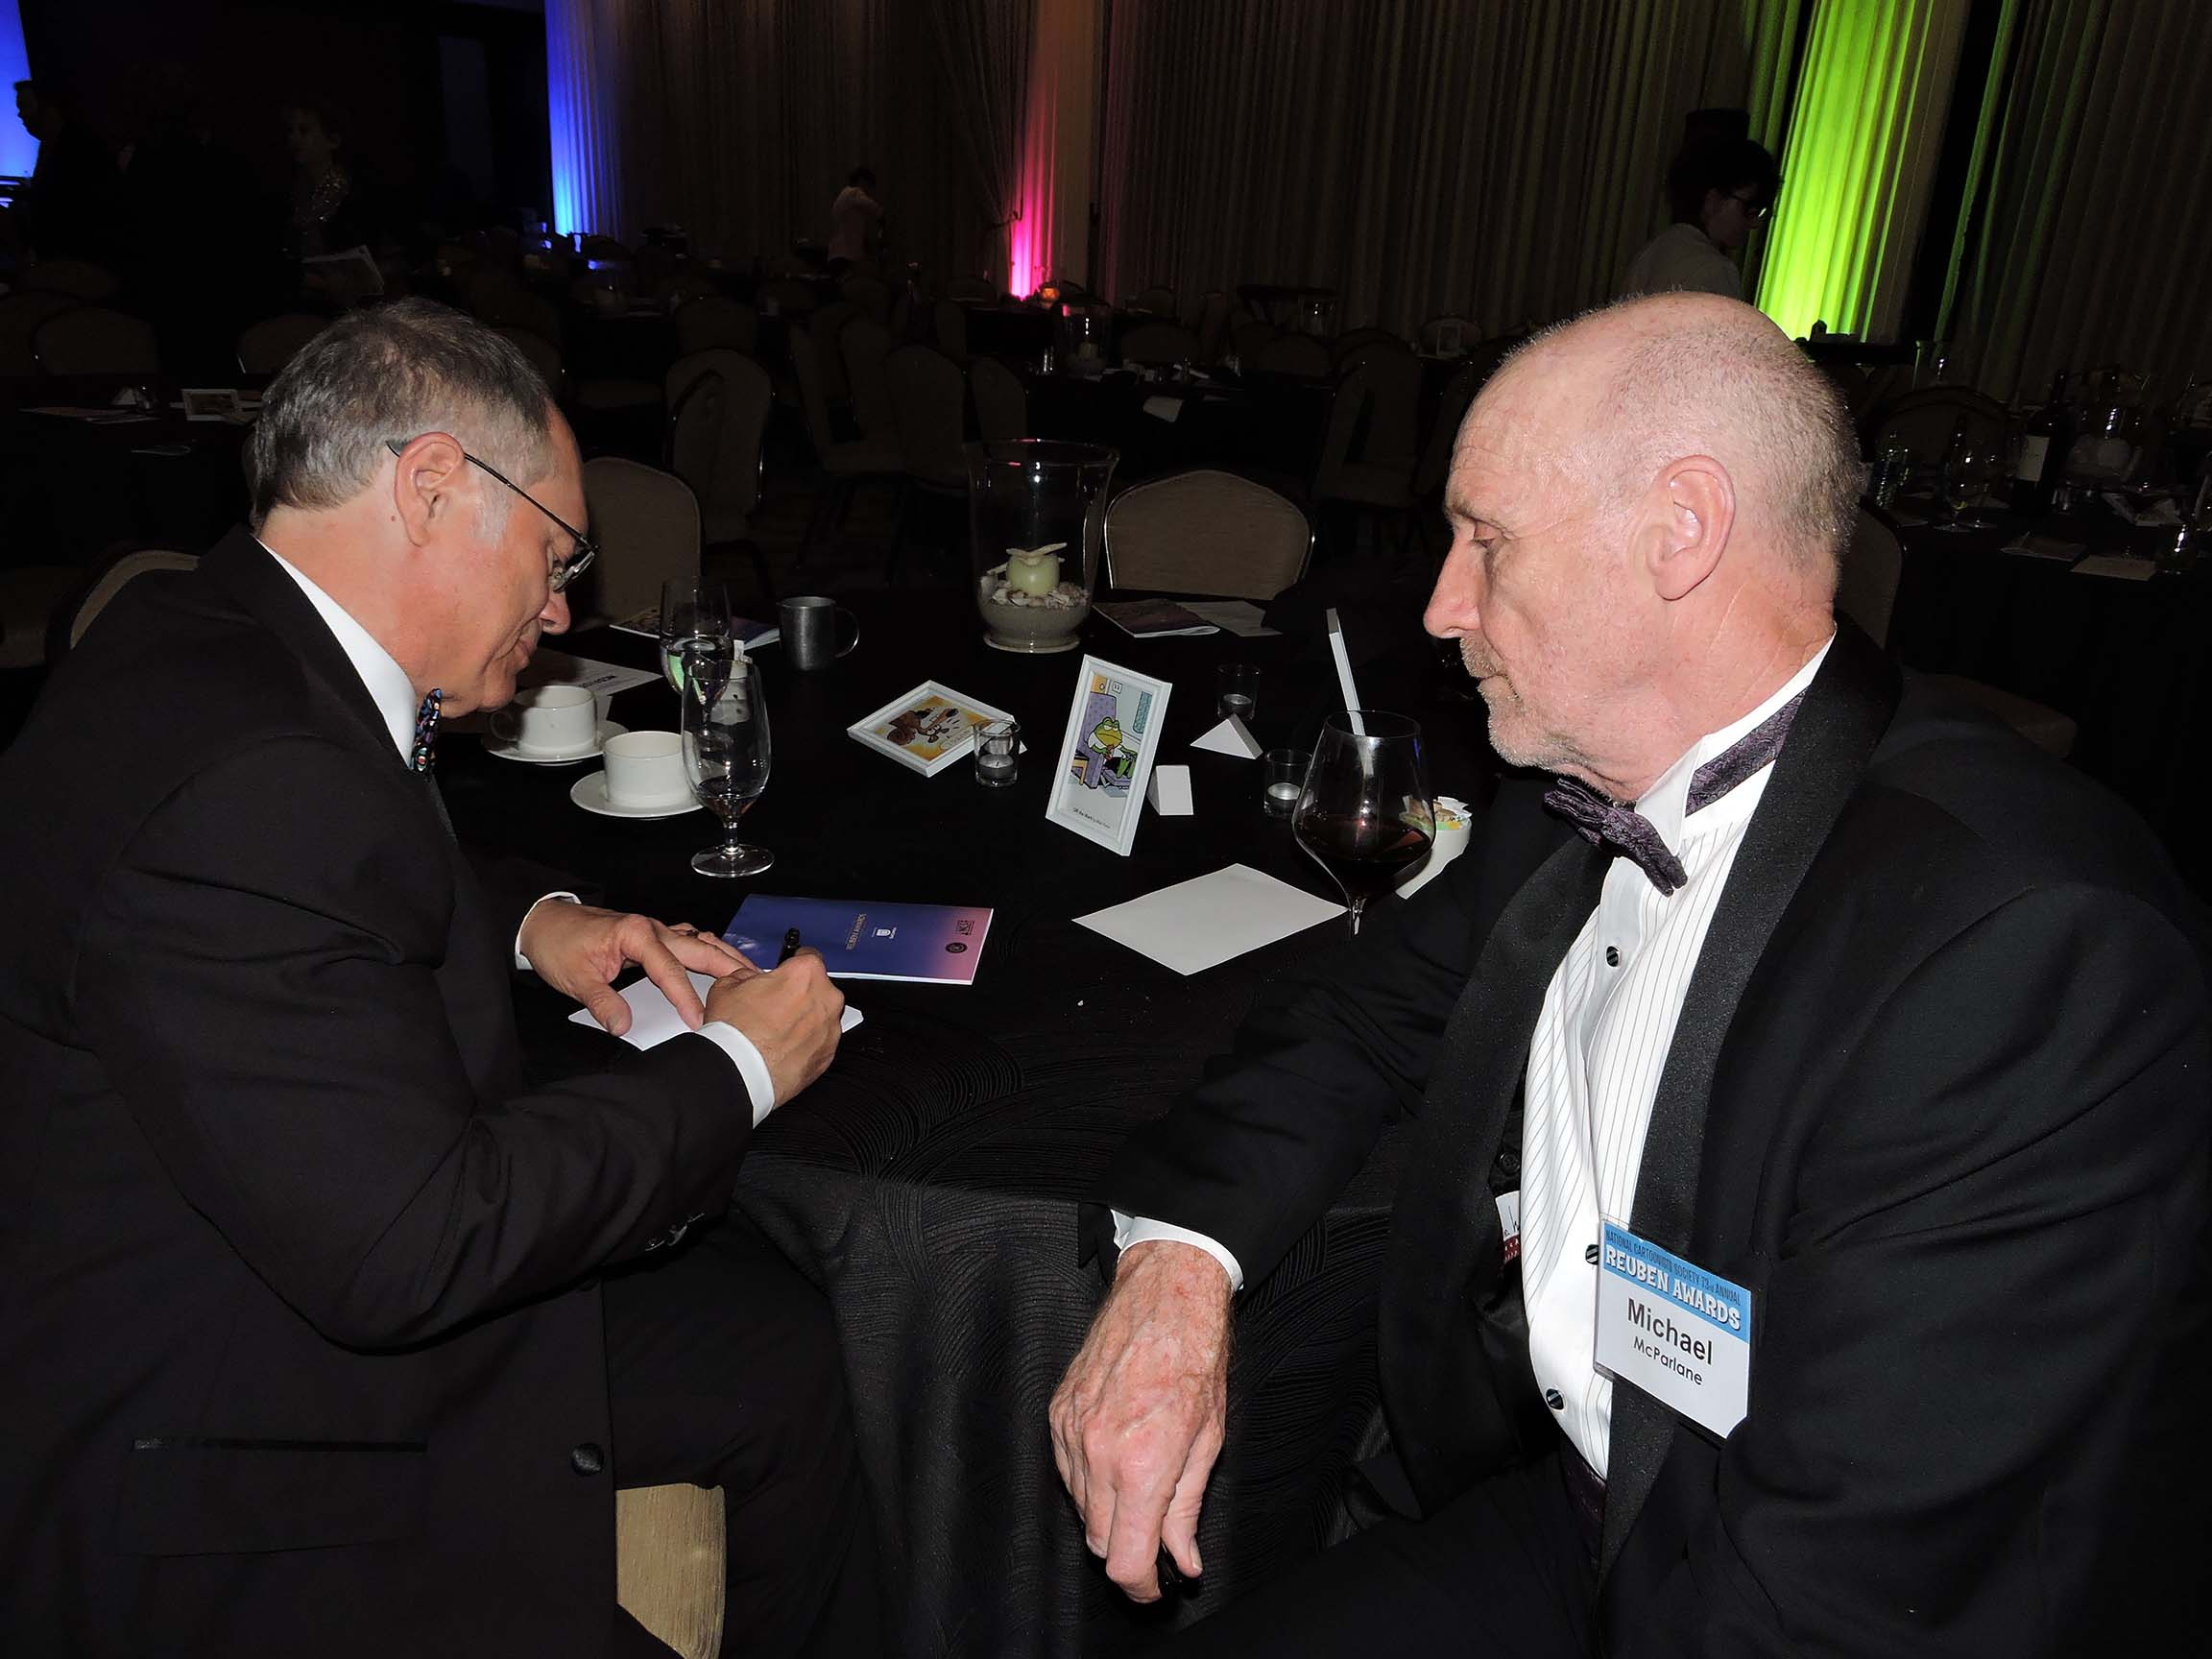 Rick Kirkman (left) and Michael McParlane